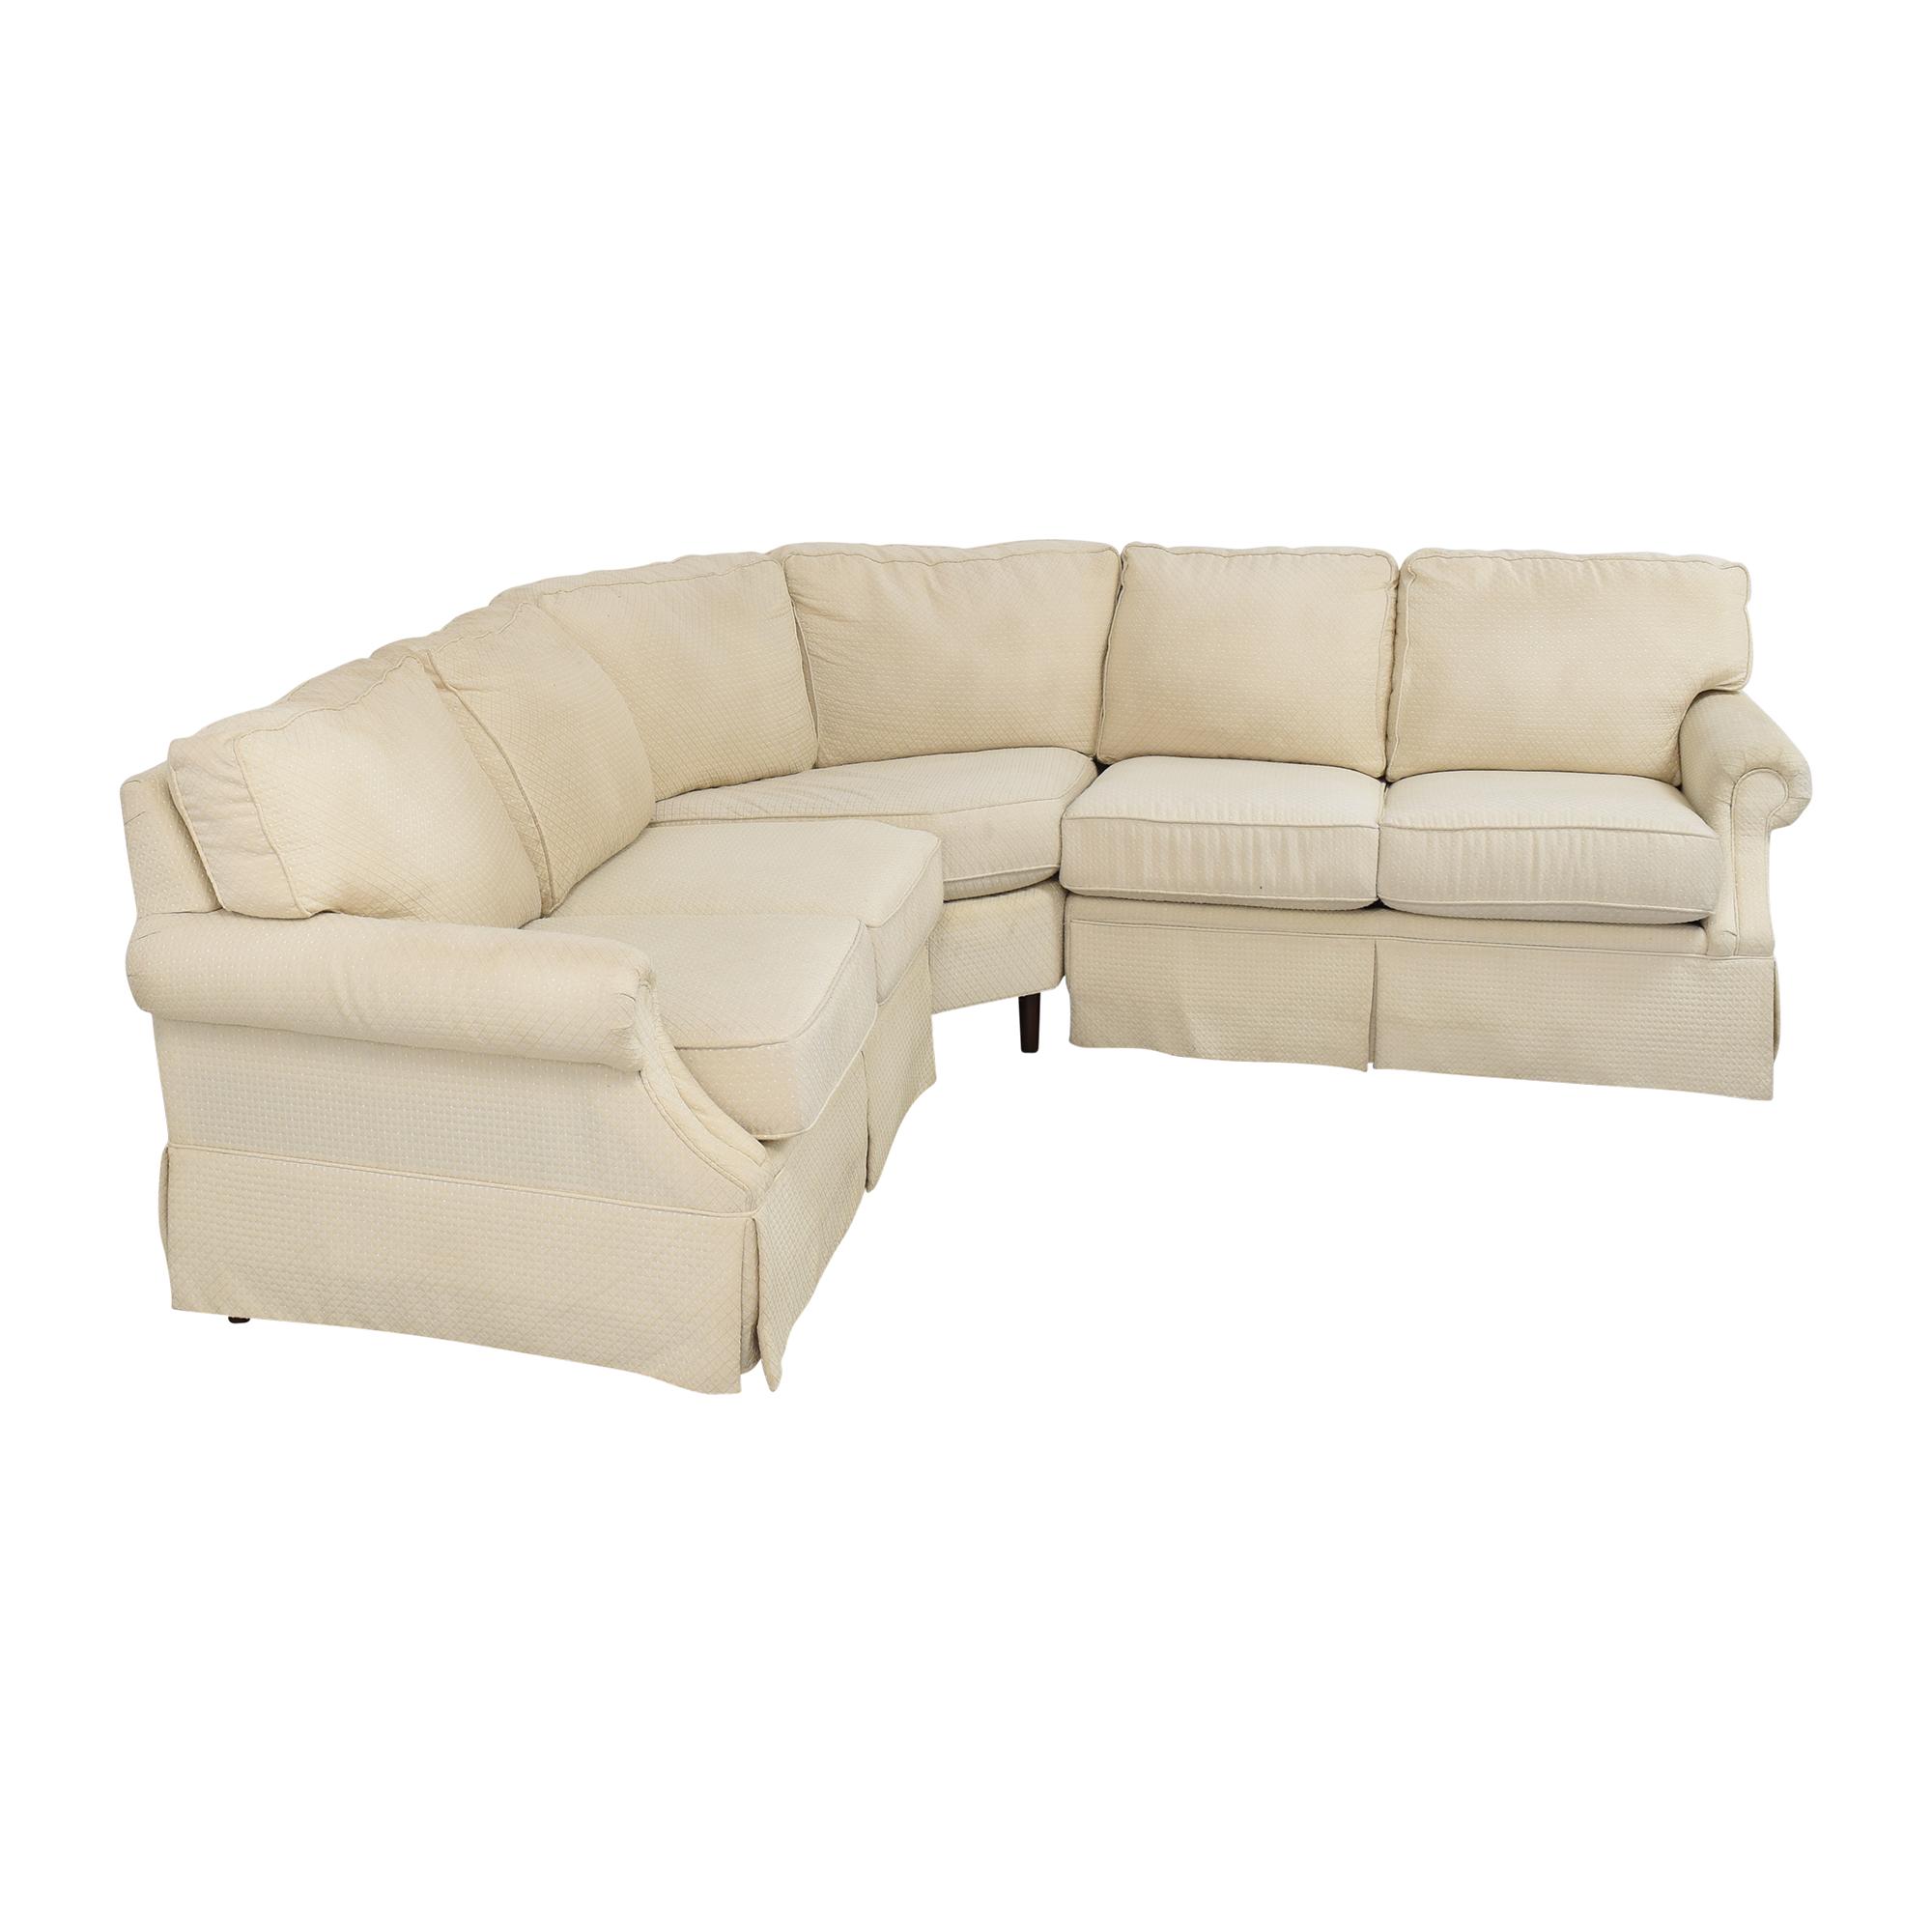 shop Flexsteel Flexsteel L Shaped Sectional Sofa online